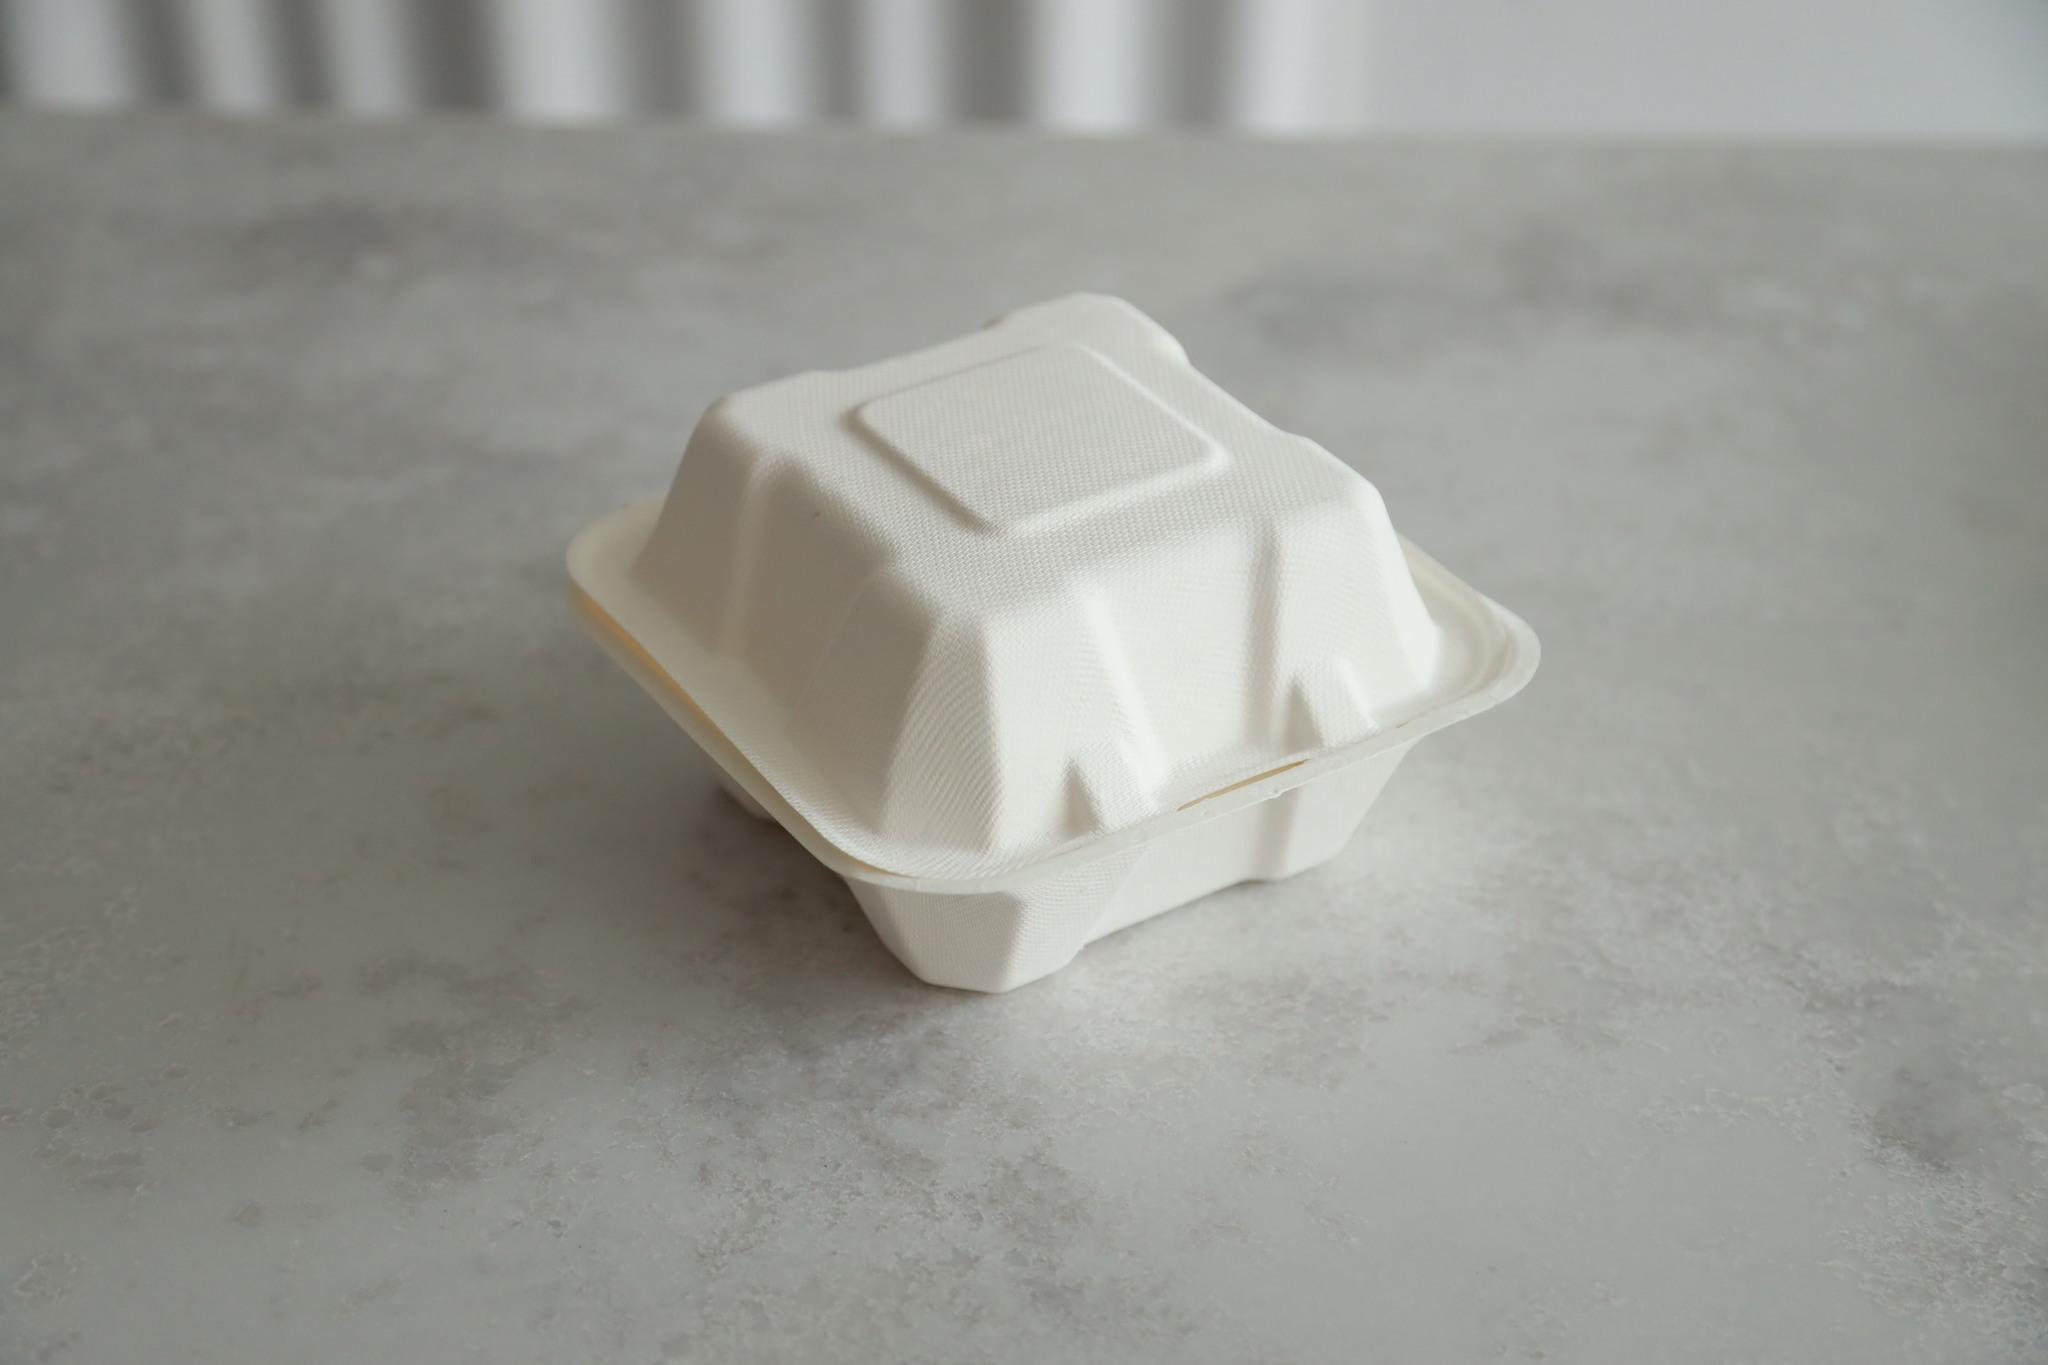 ЭКО-коробка под бенто-торт, 450 мл, 154х152х88 мм